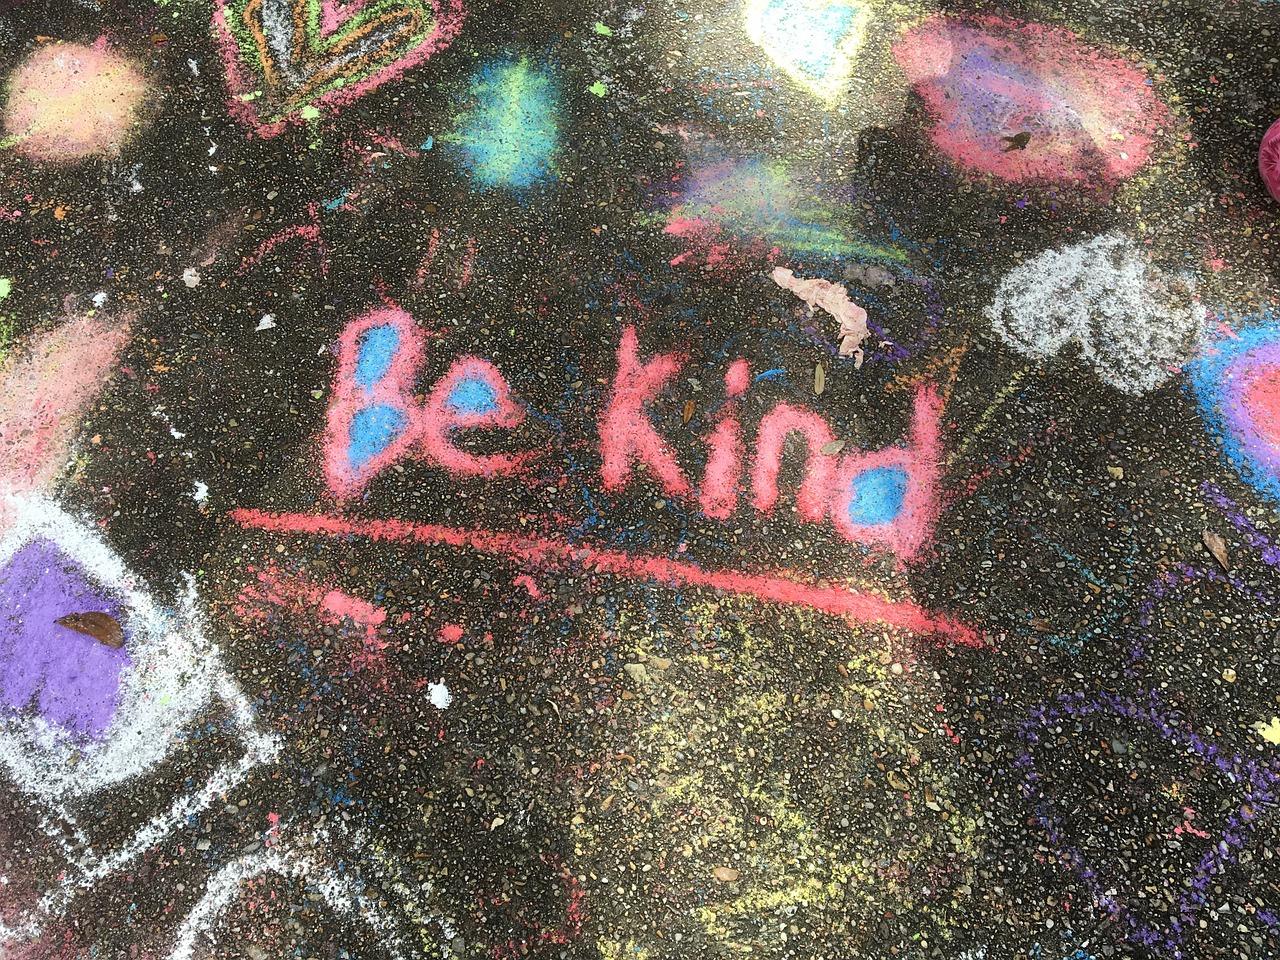 kindness-1197351_1280.jpg